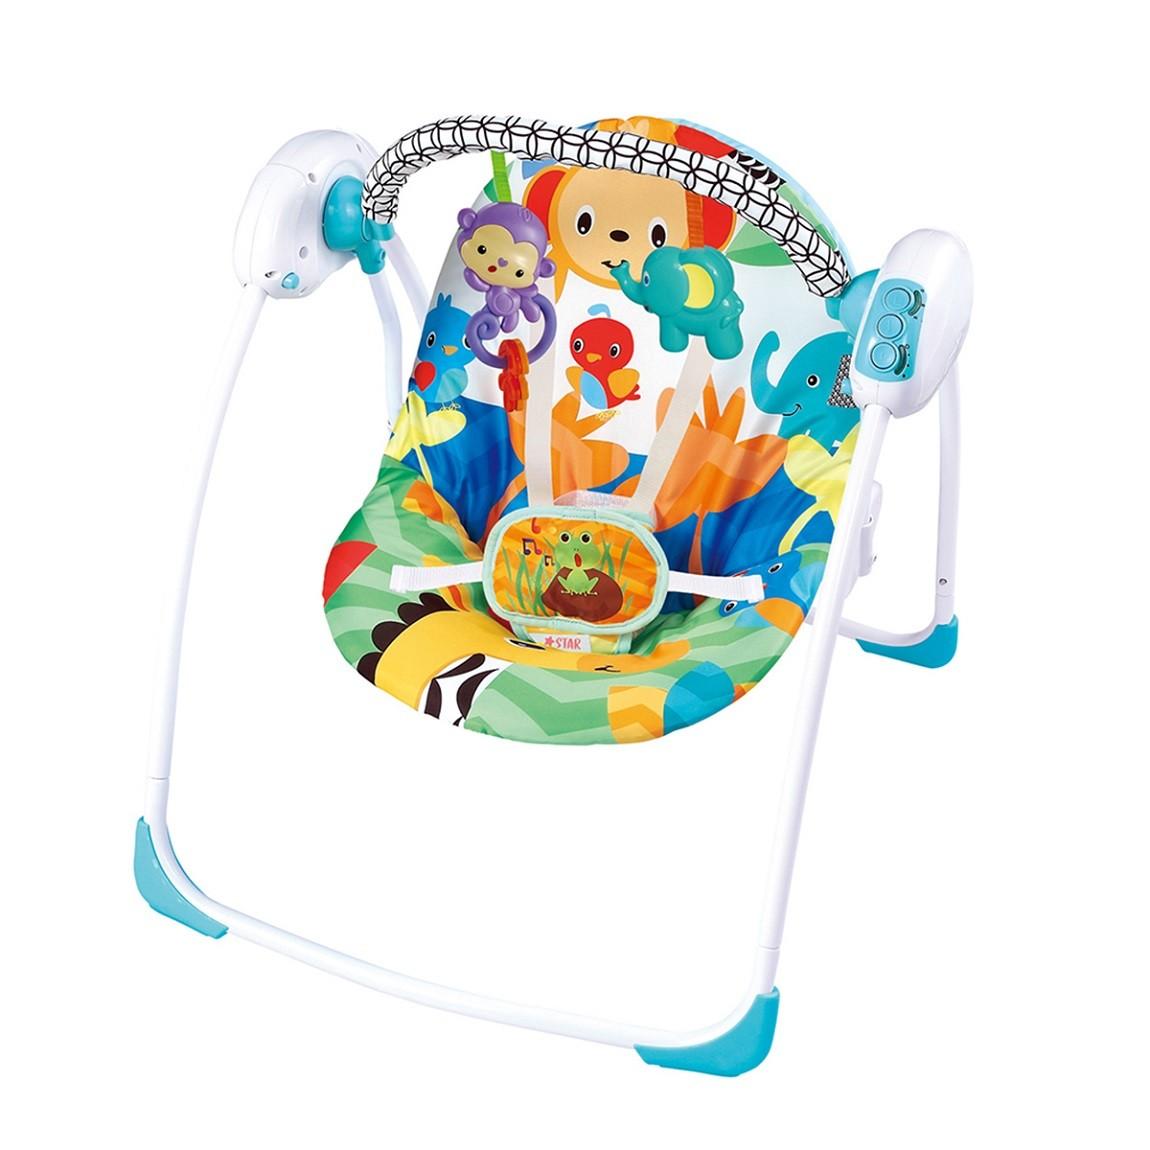 Cadeira descanso Bebê 11kg Swing Star Baby